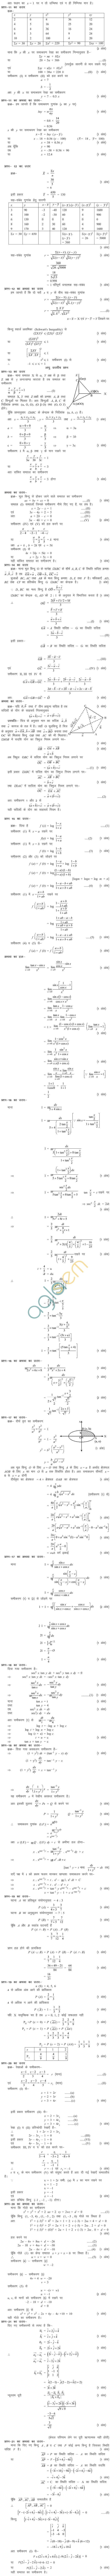 MP BoardClass XII Mathematics Model Questions & Answers -Set 2